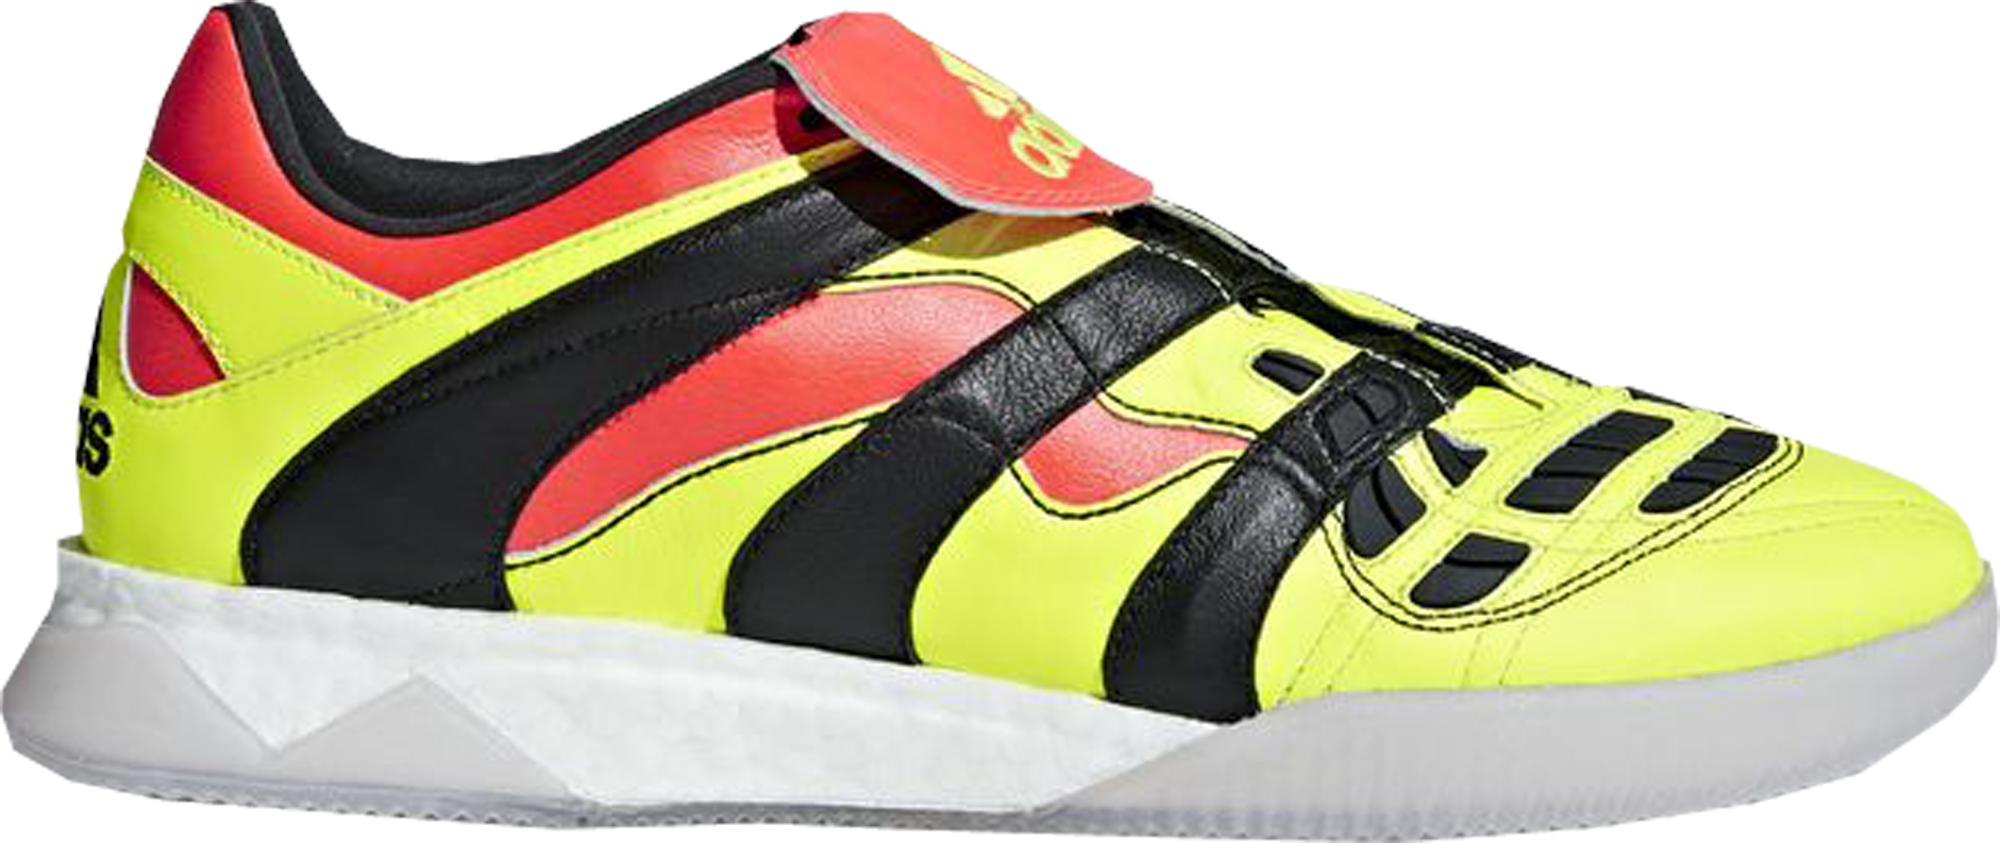 adidas Predator Accelerator Trainers Solar Yellow